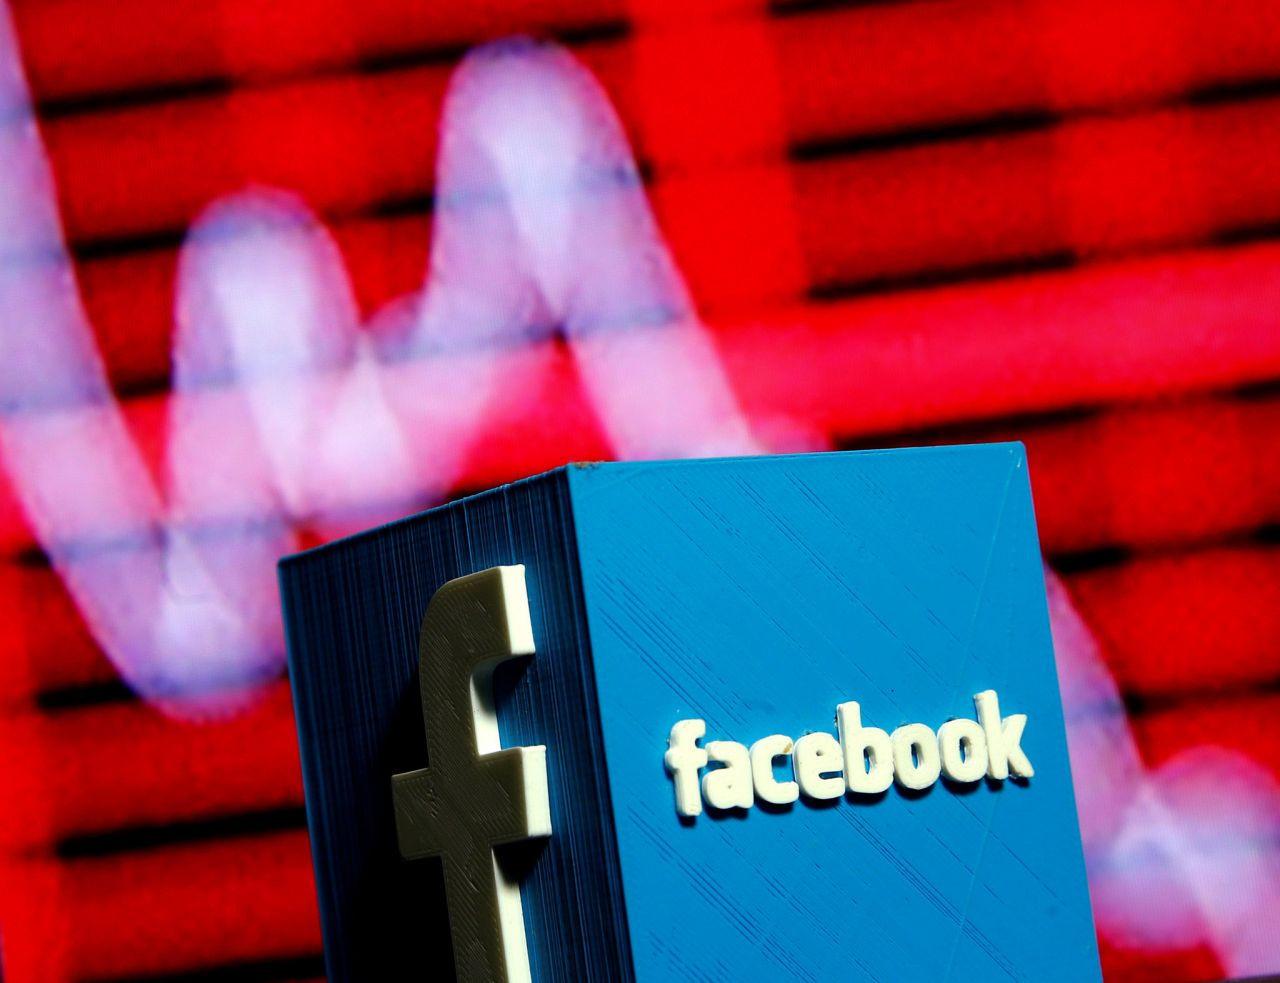 Facebook'un bilançosu açıklandı - Page 3